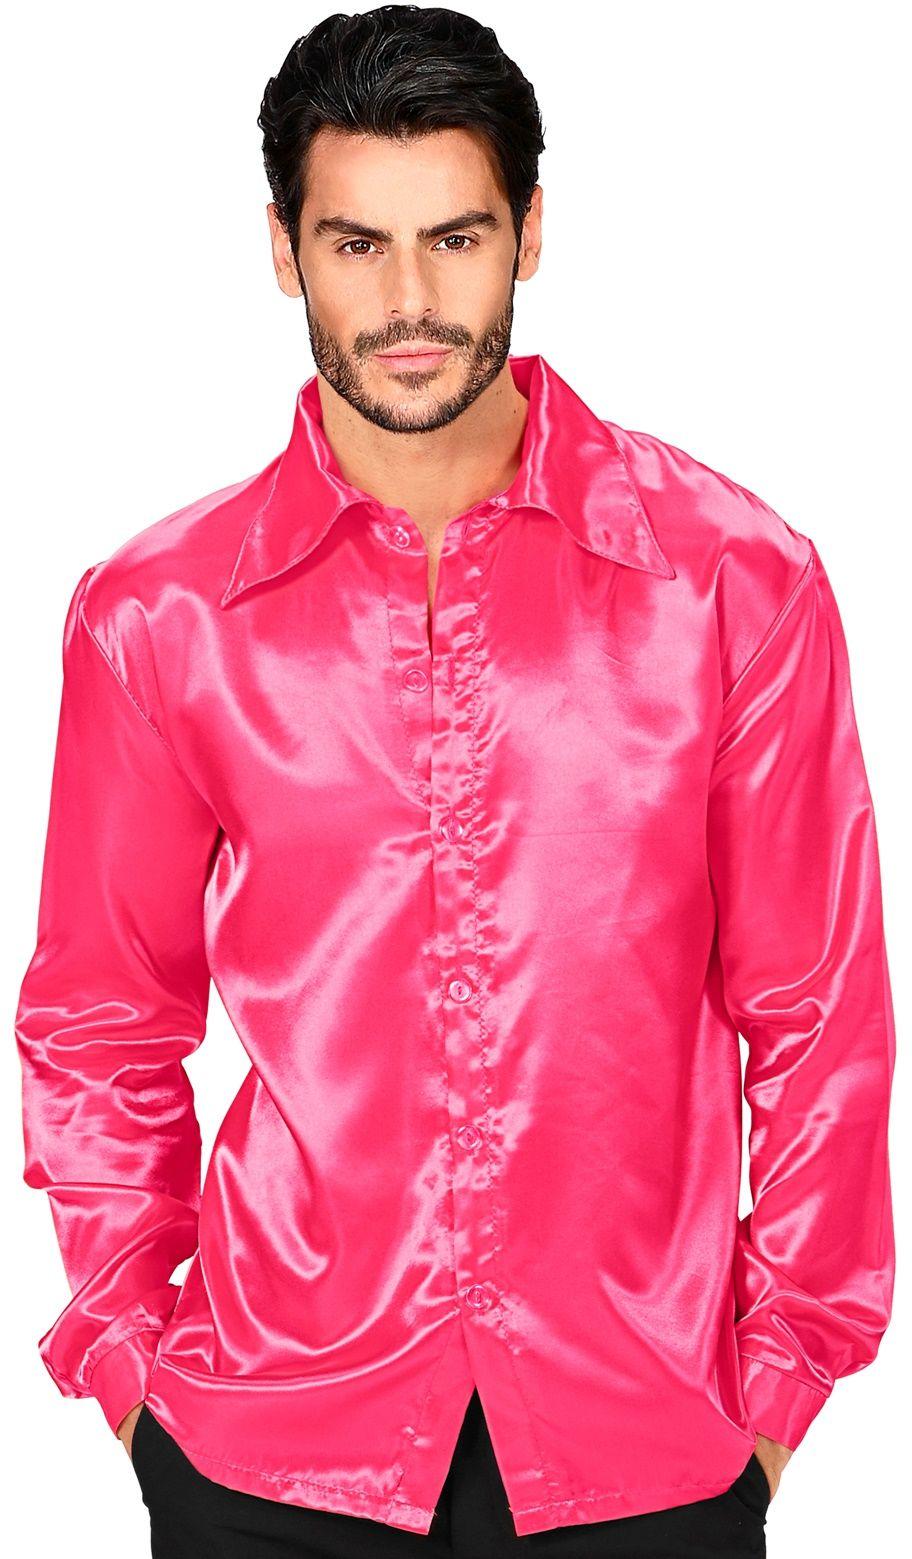 Jaren 70 disco shirt, roze